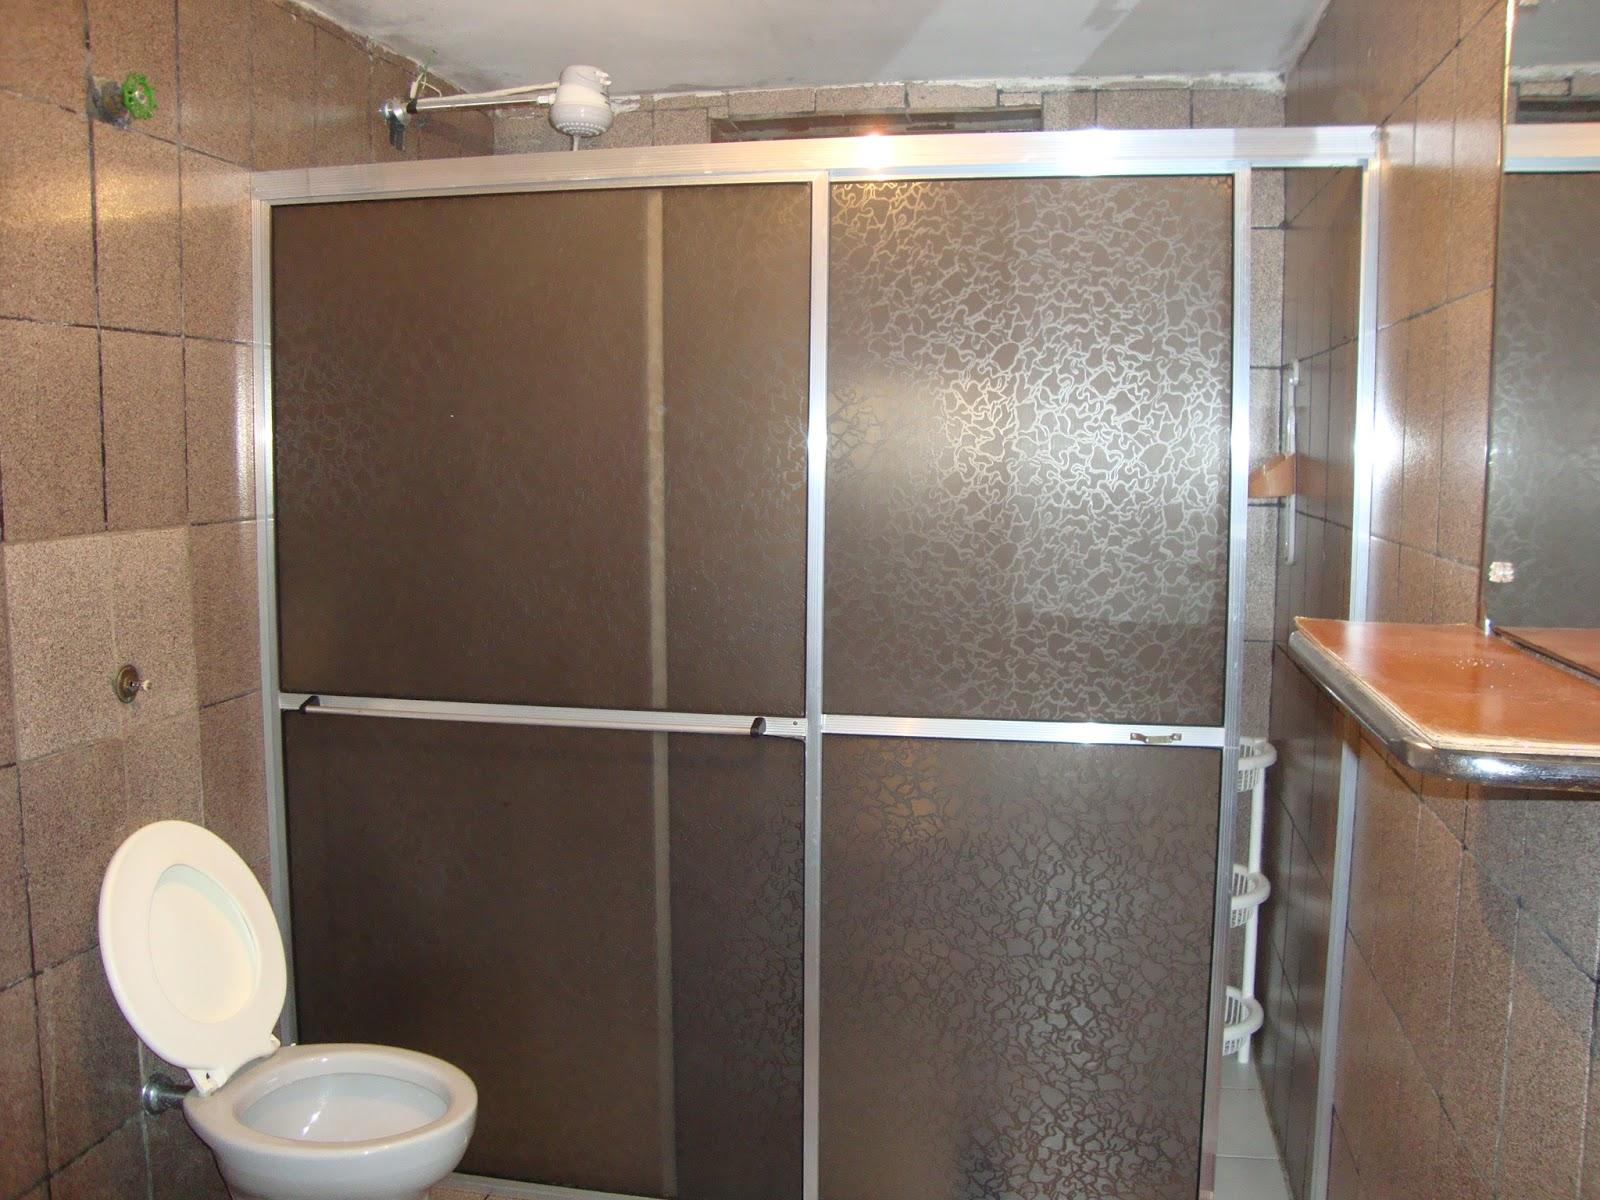 Mart in design: Projeto de reforma Banheiro #965935 1600 1200